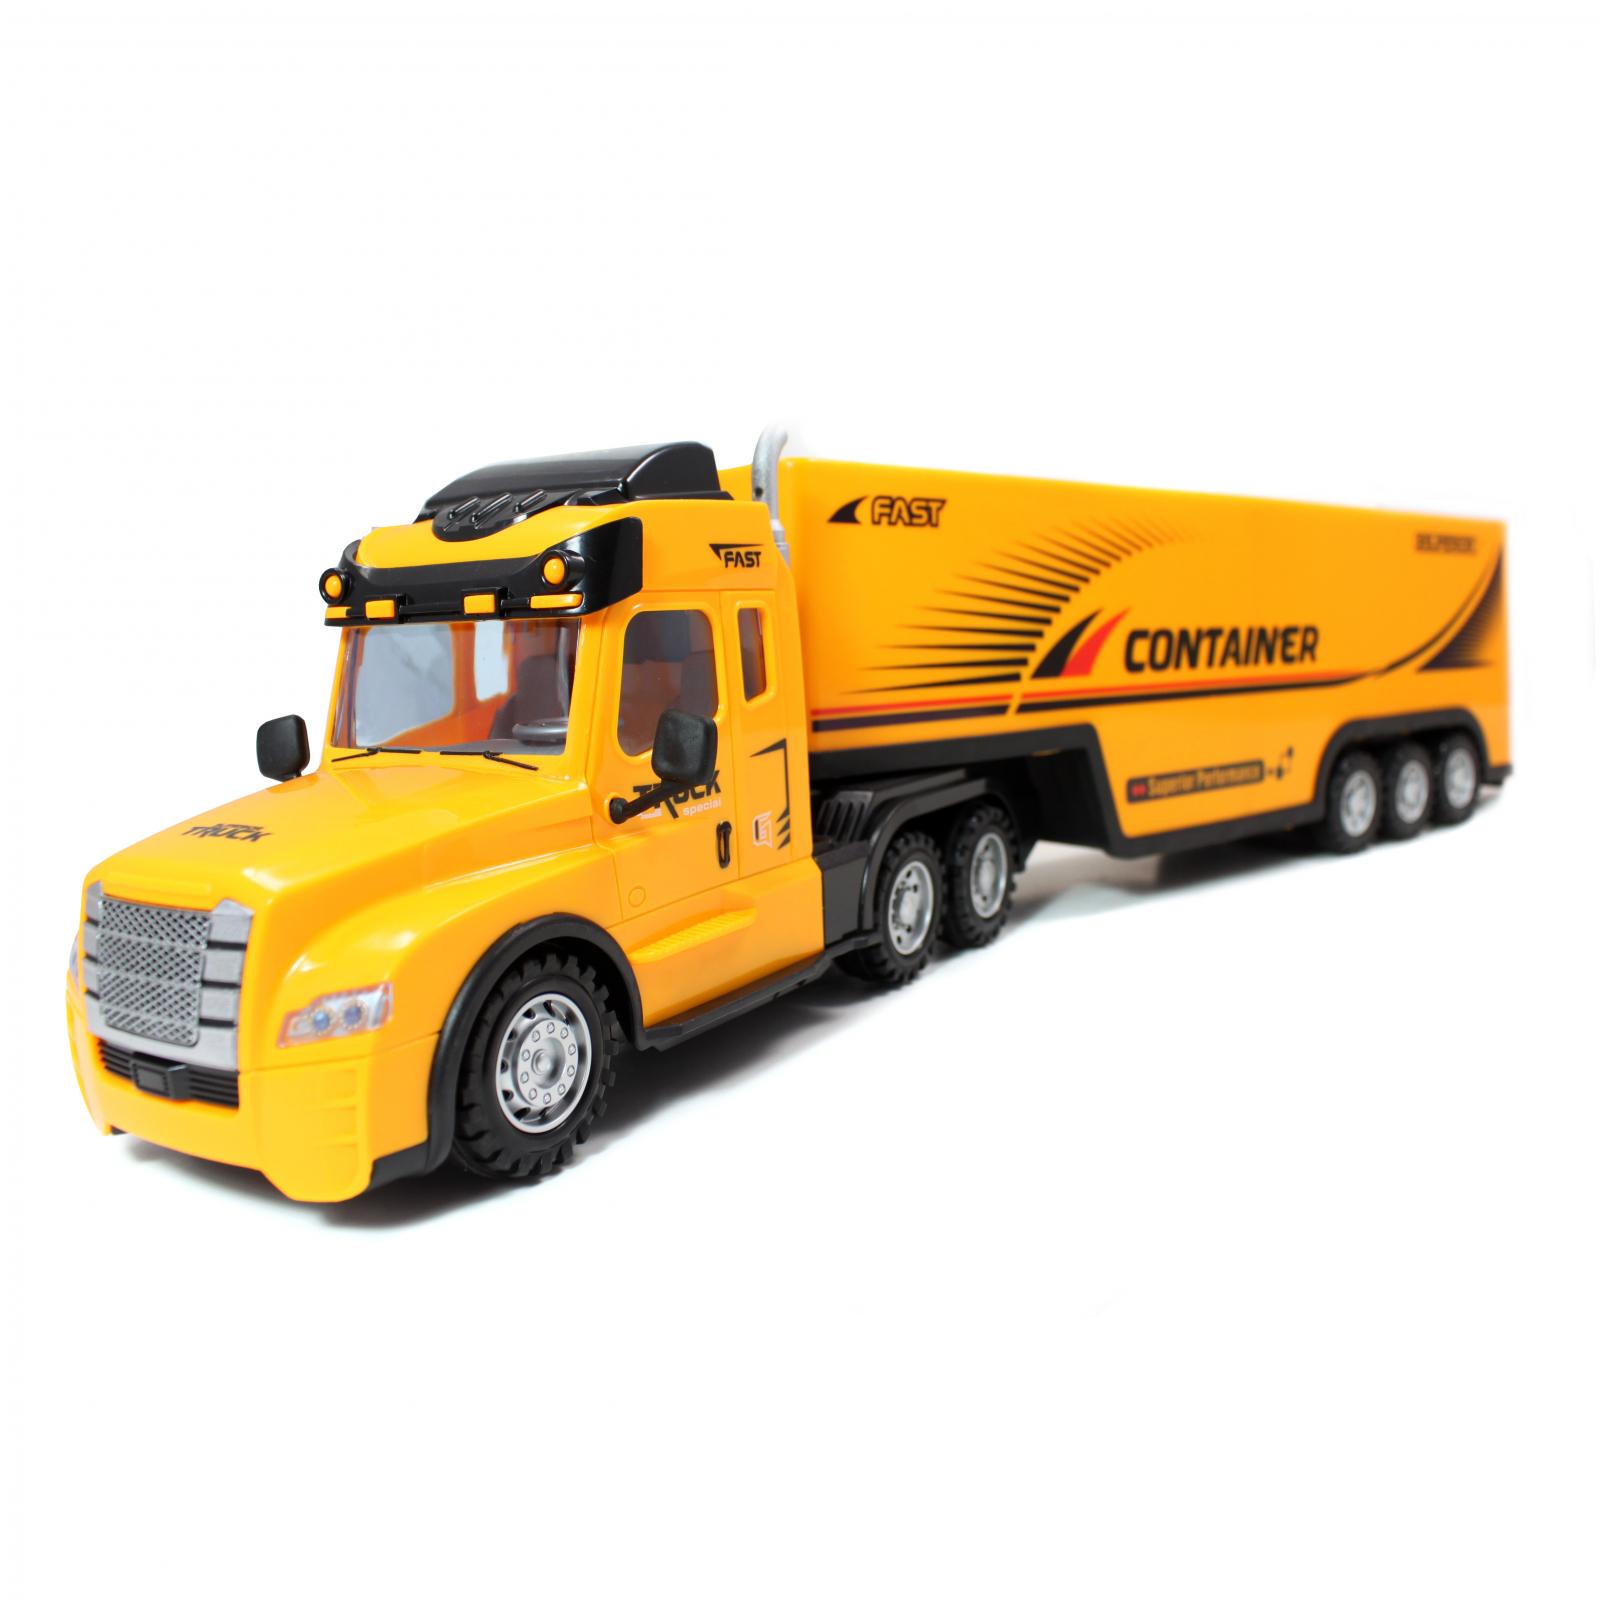 Kidplokio Remote Control Car RC Truck Semi Carrier - Yellow